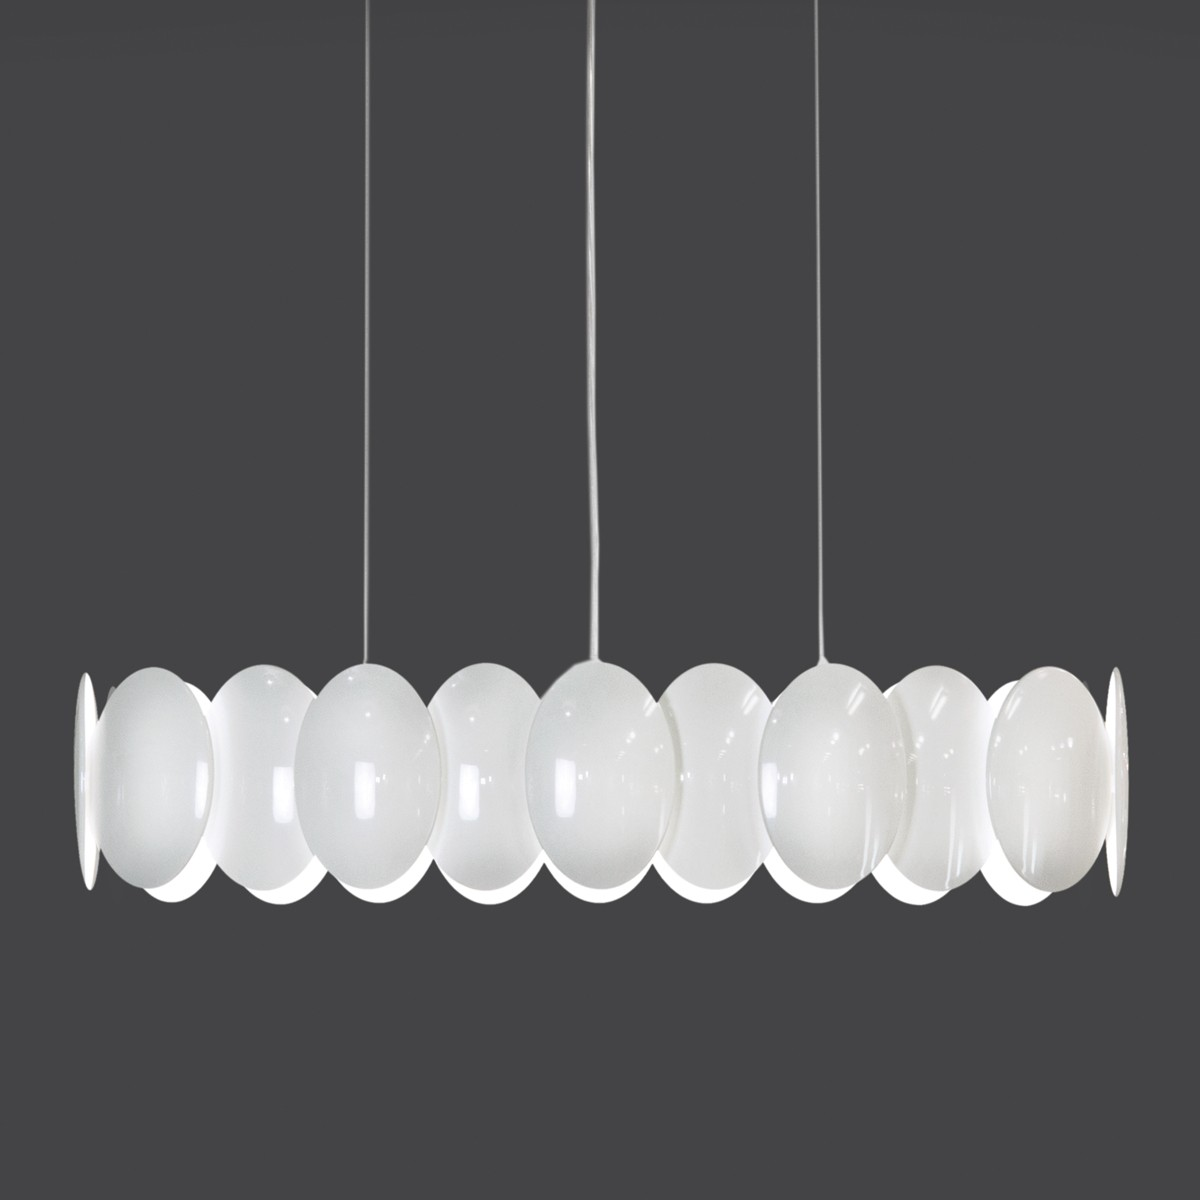 Milan Obolo Pendelleuchte, oval, weiß lackiert